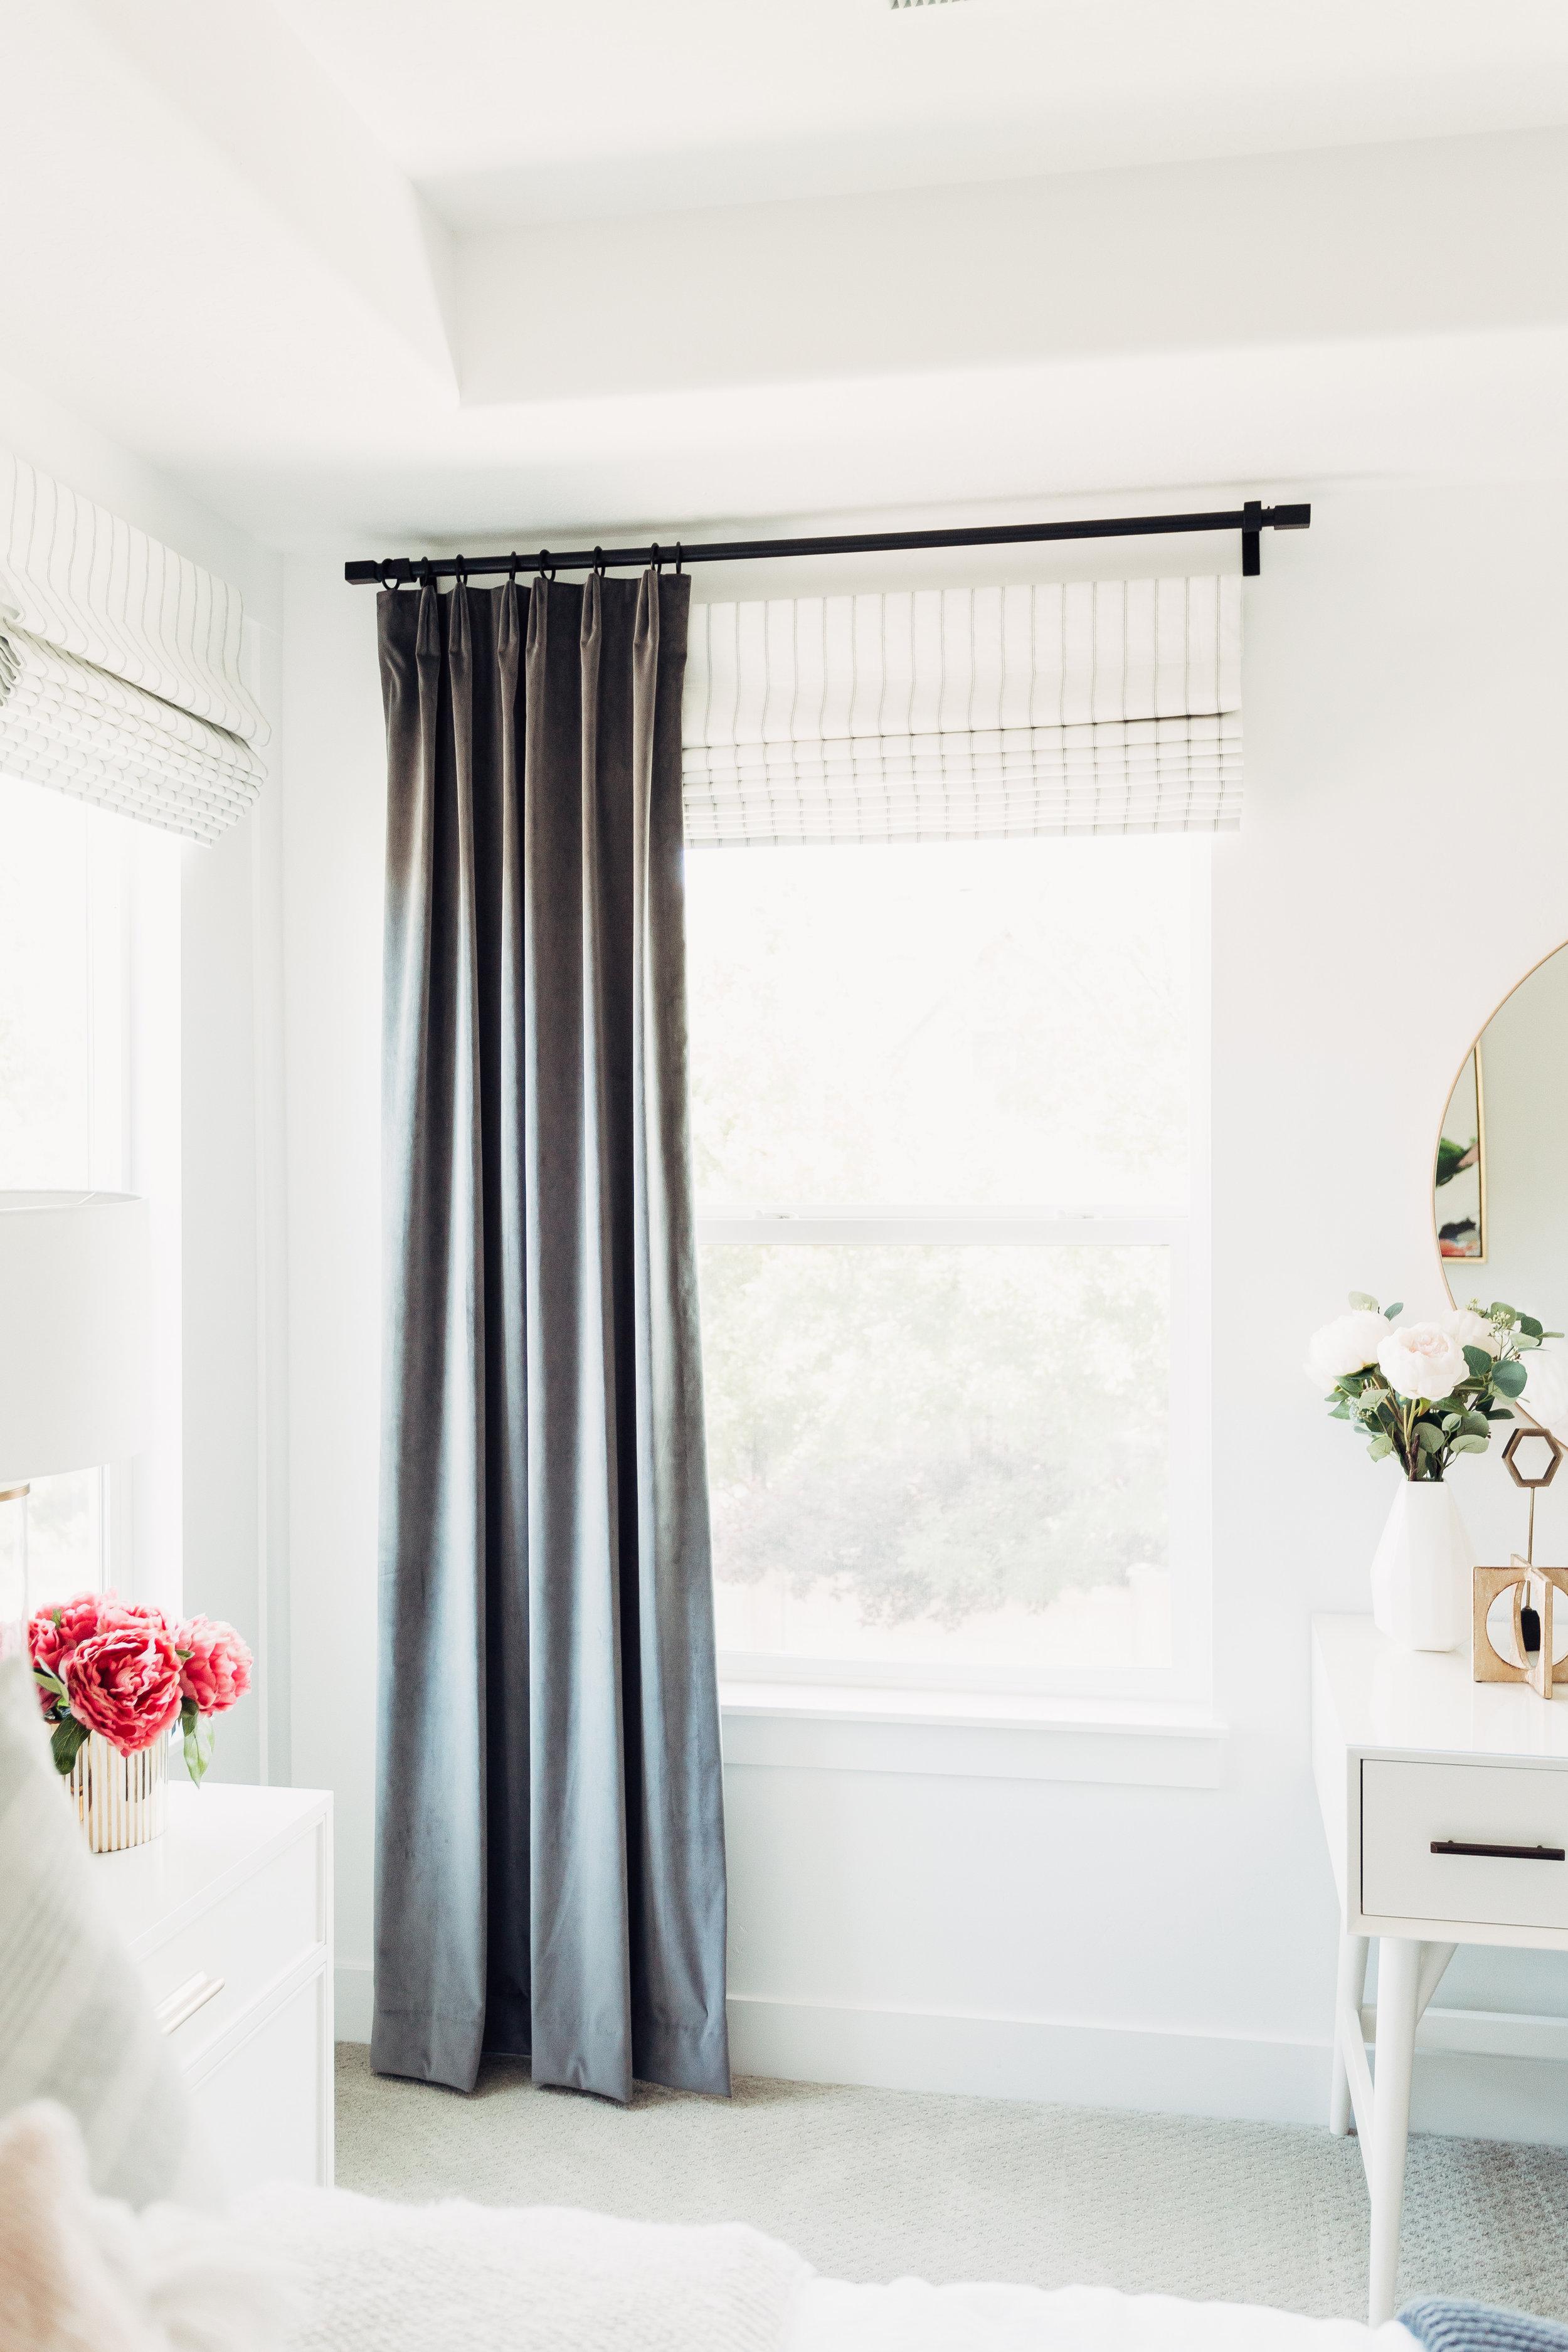 Abby Room Reveal-166.jpg